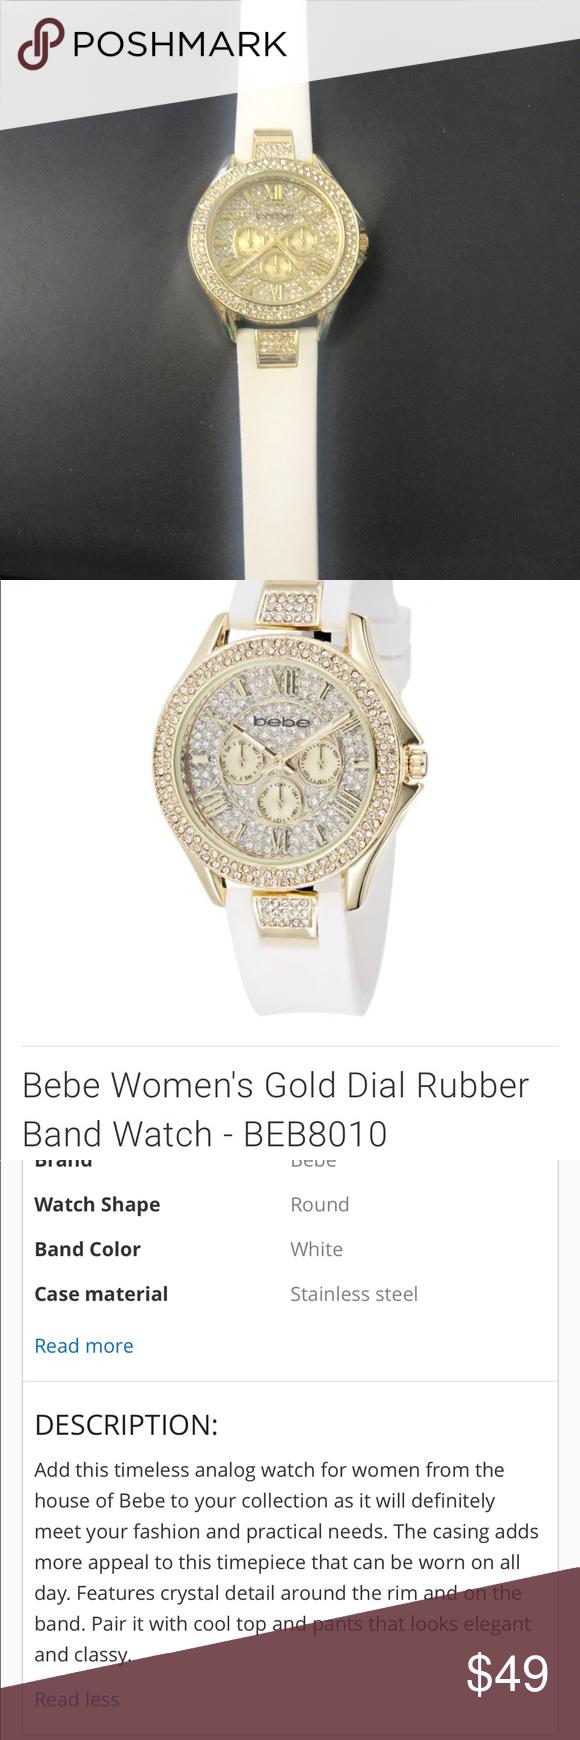 f3ab7311d2 Women's babe Watch Like new!!! Super cute Elastic wrist band bebe  Accessories Watches